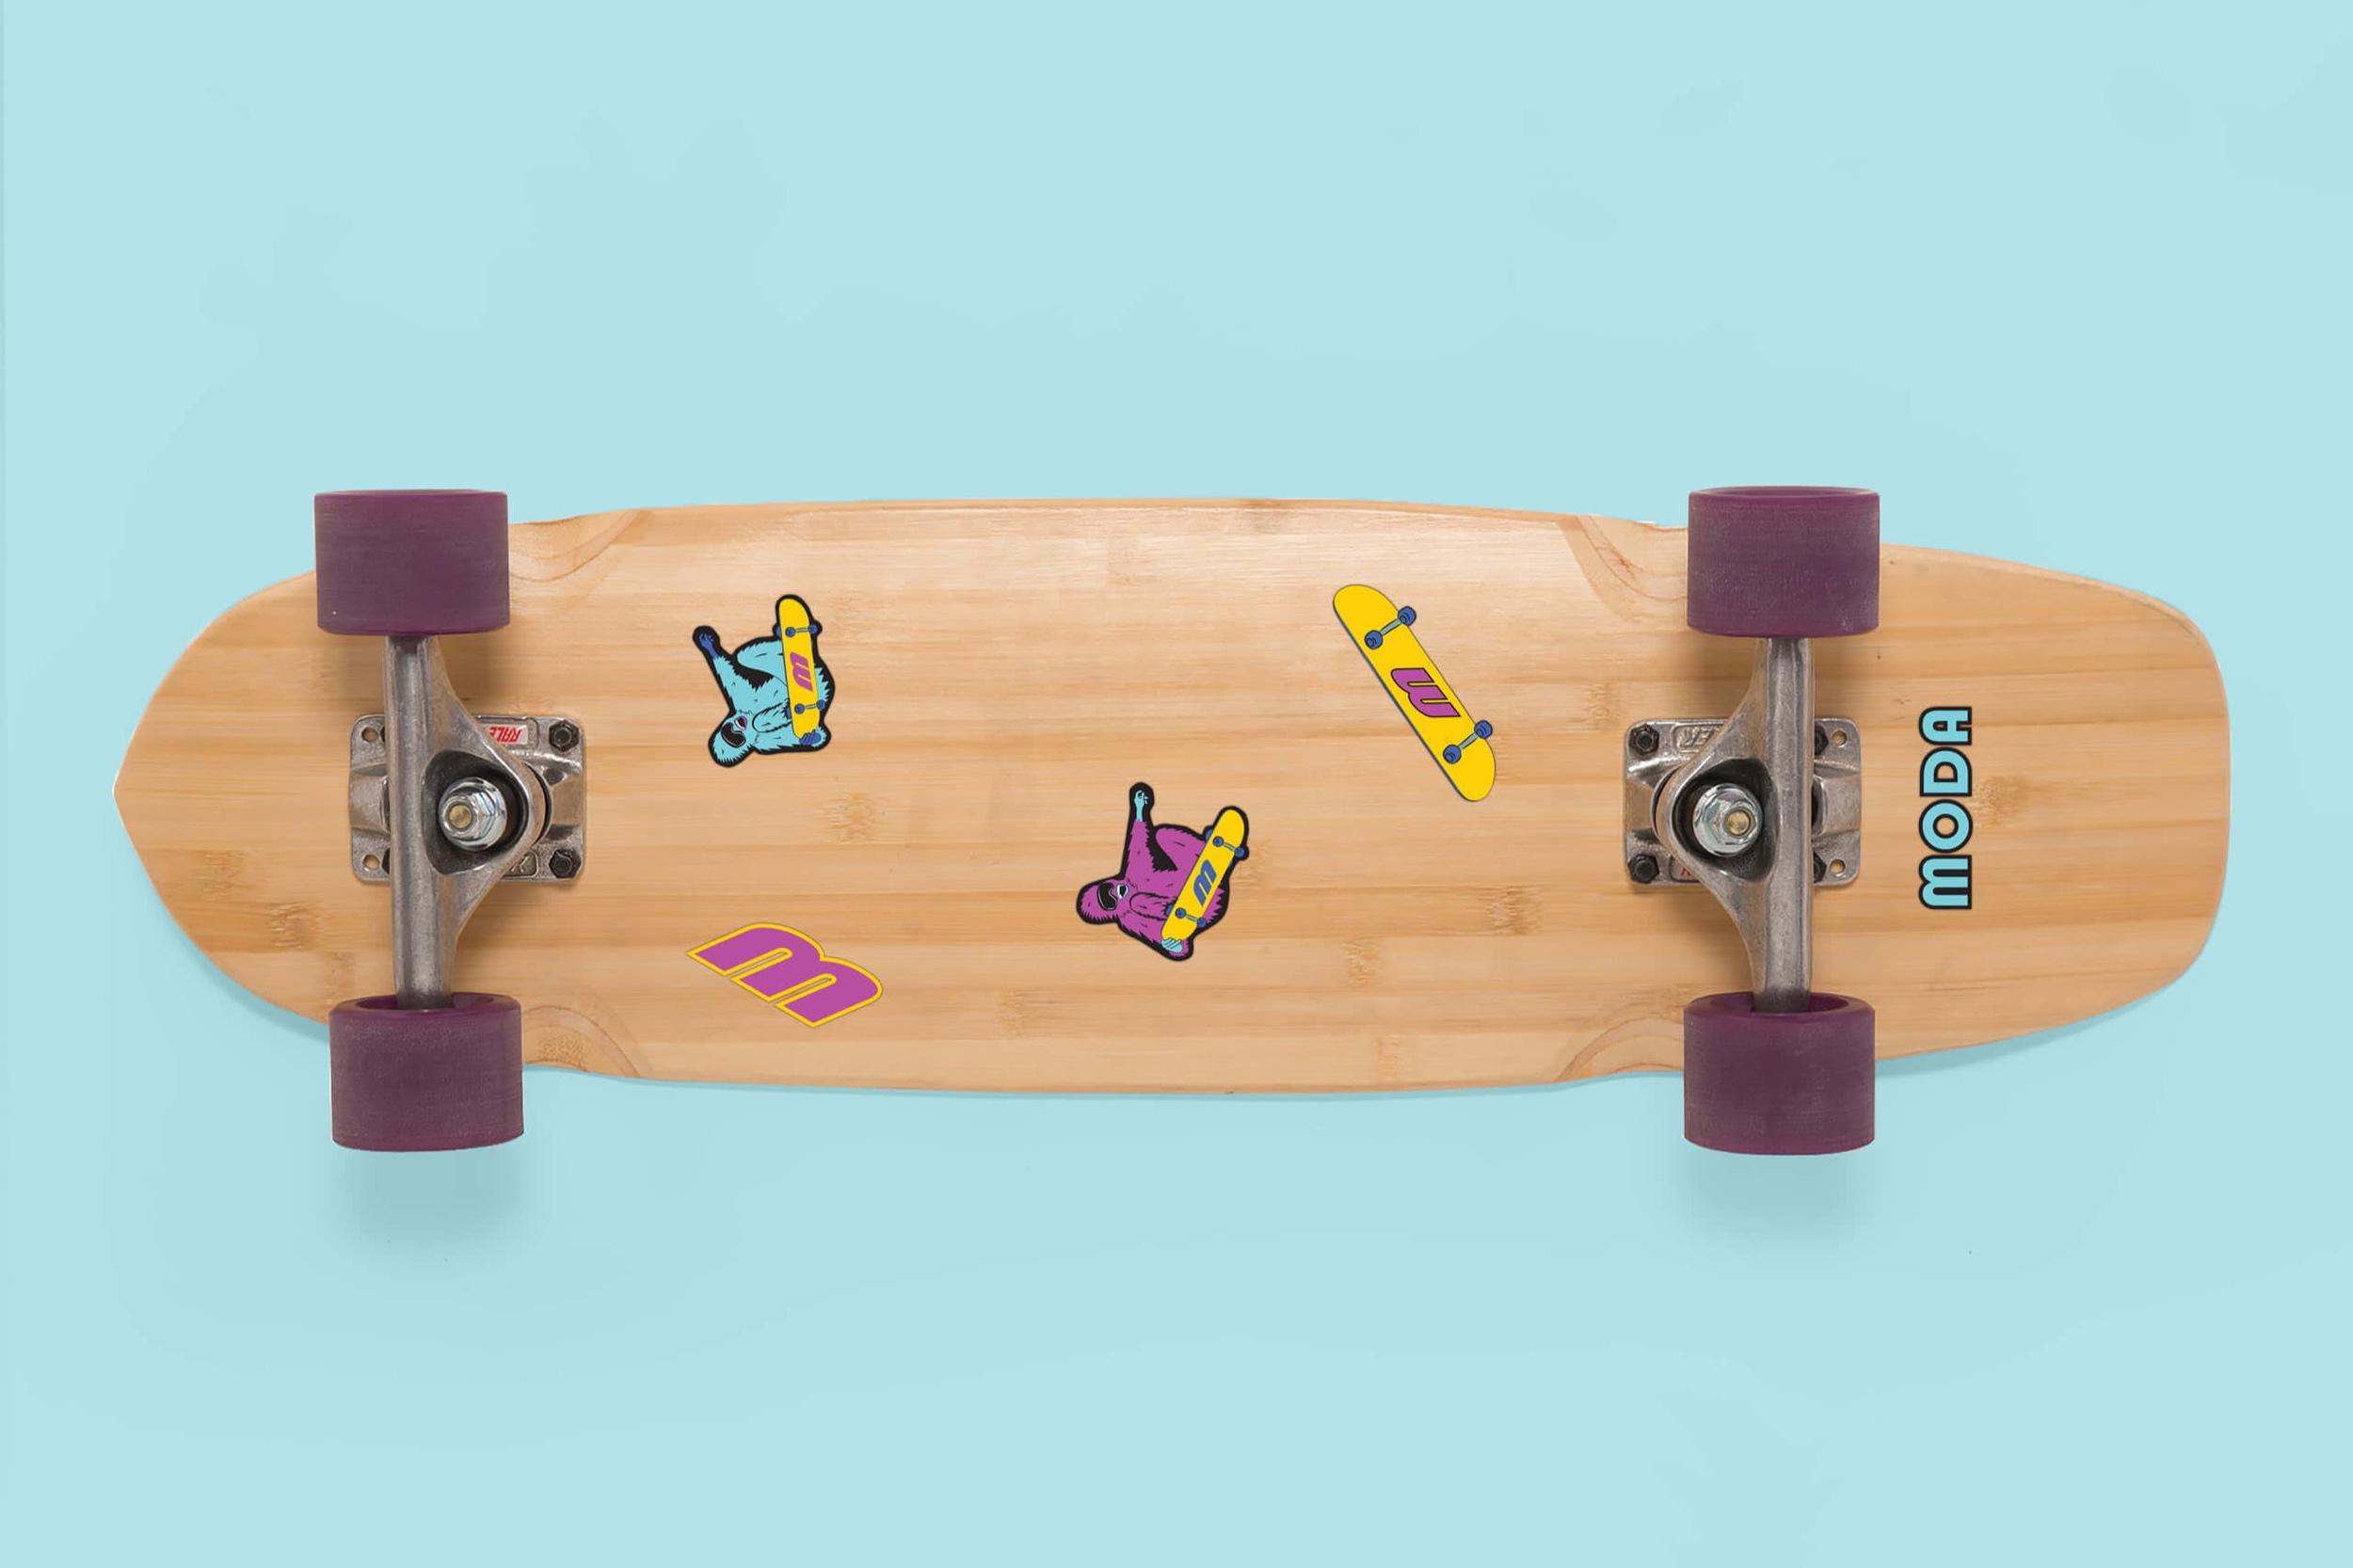 Eric_Holton_MODA3_Skateboard.jpg